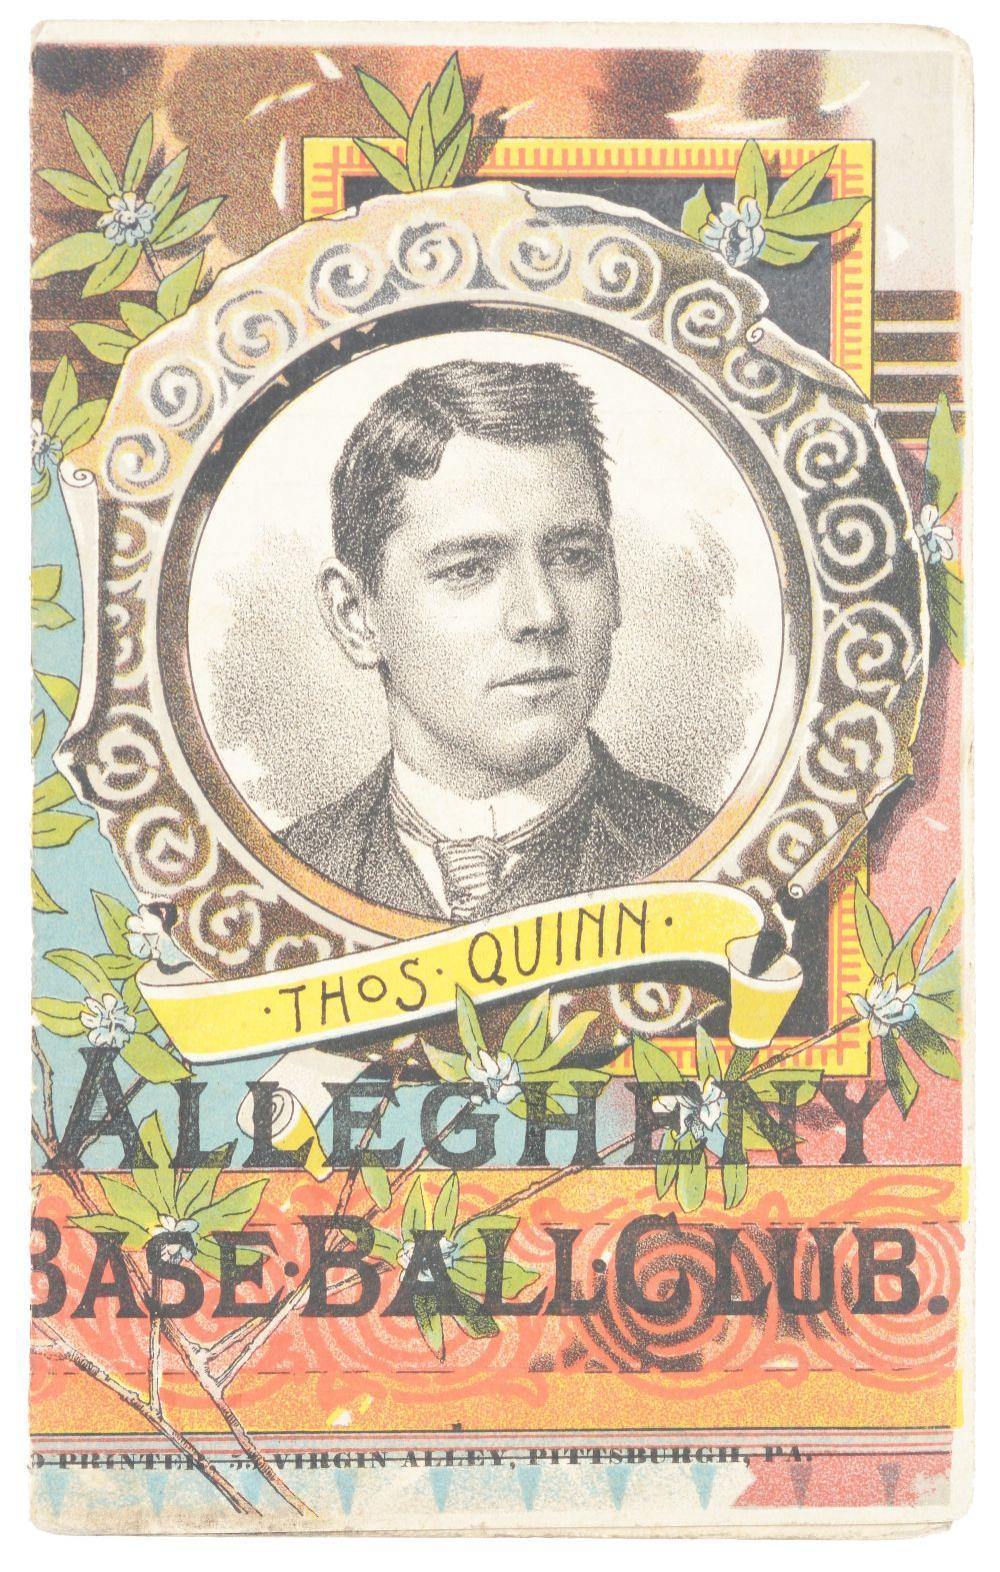 Lot 2031: Very Early Allegheny Baseball Club Scorecard.